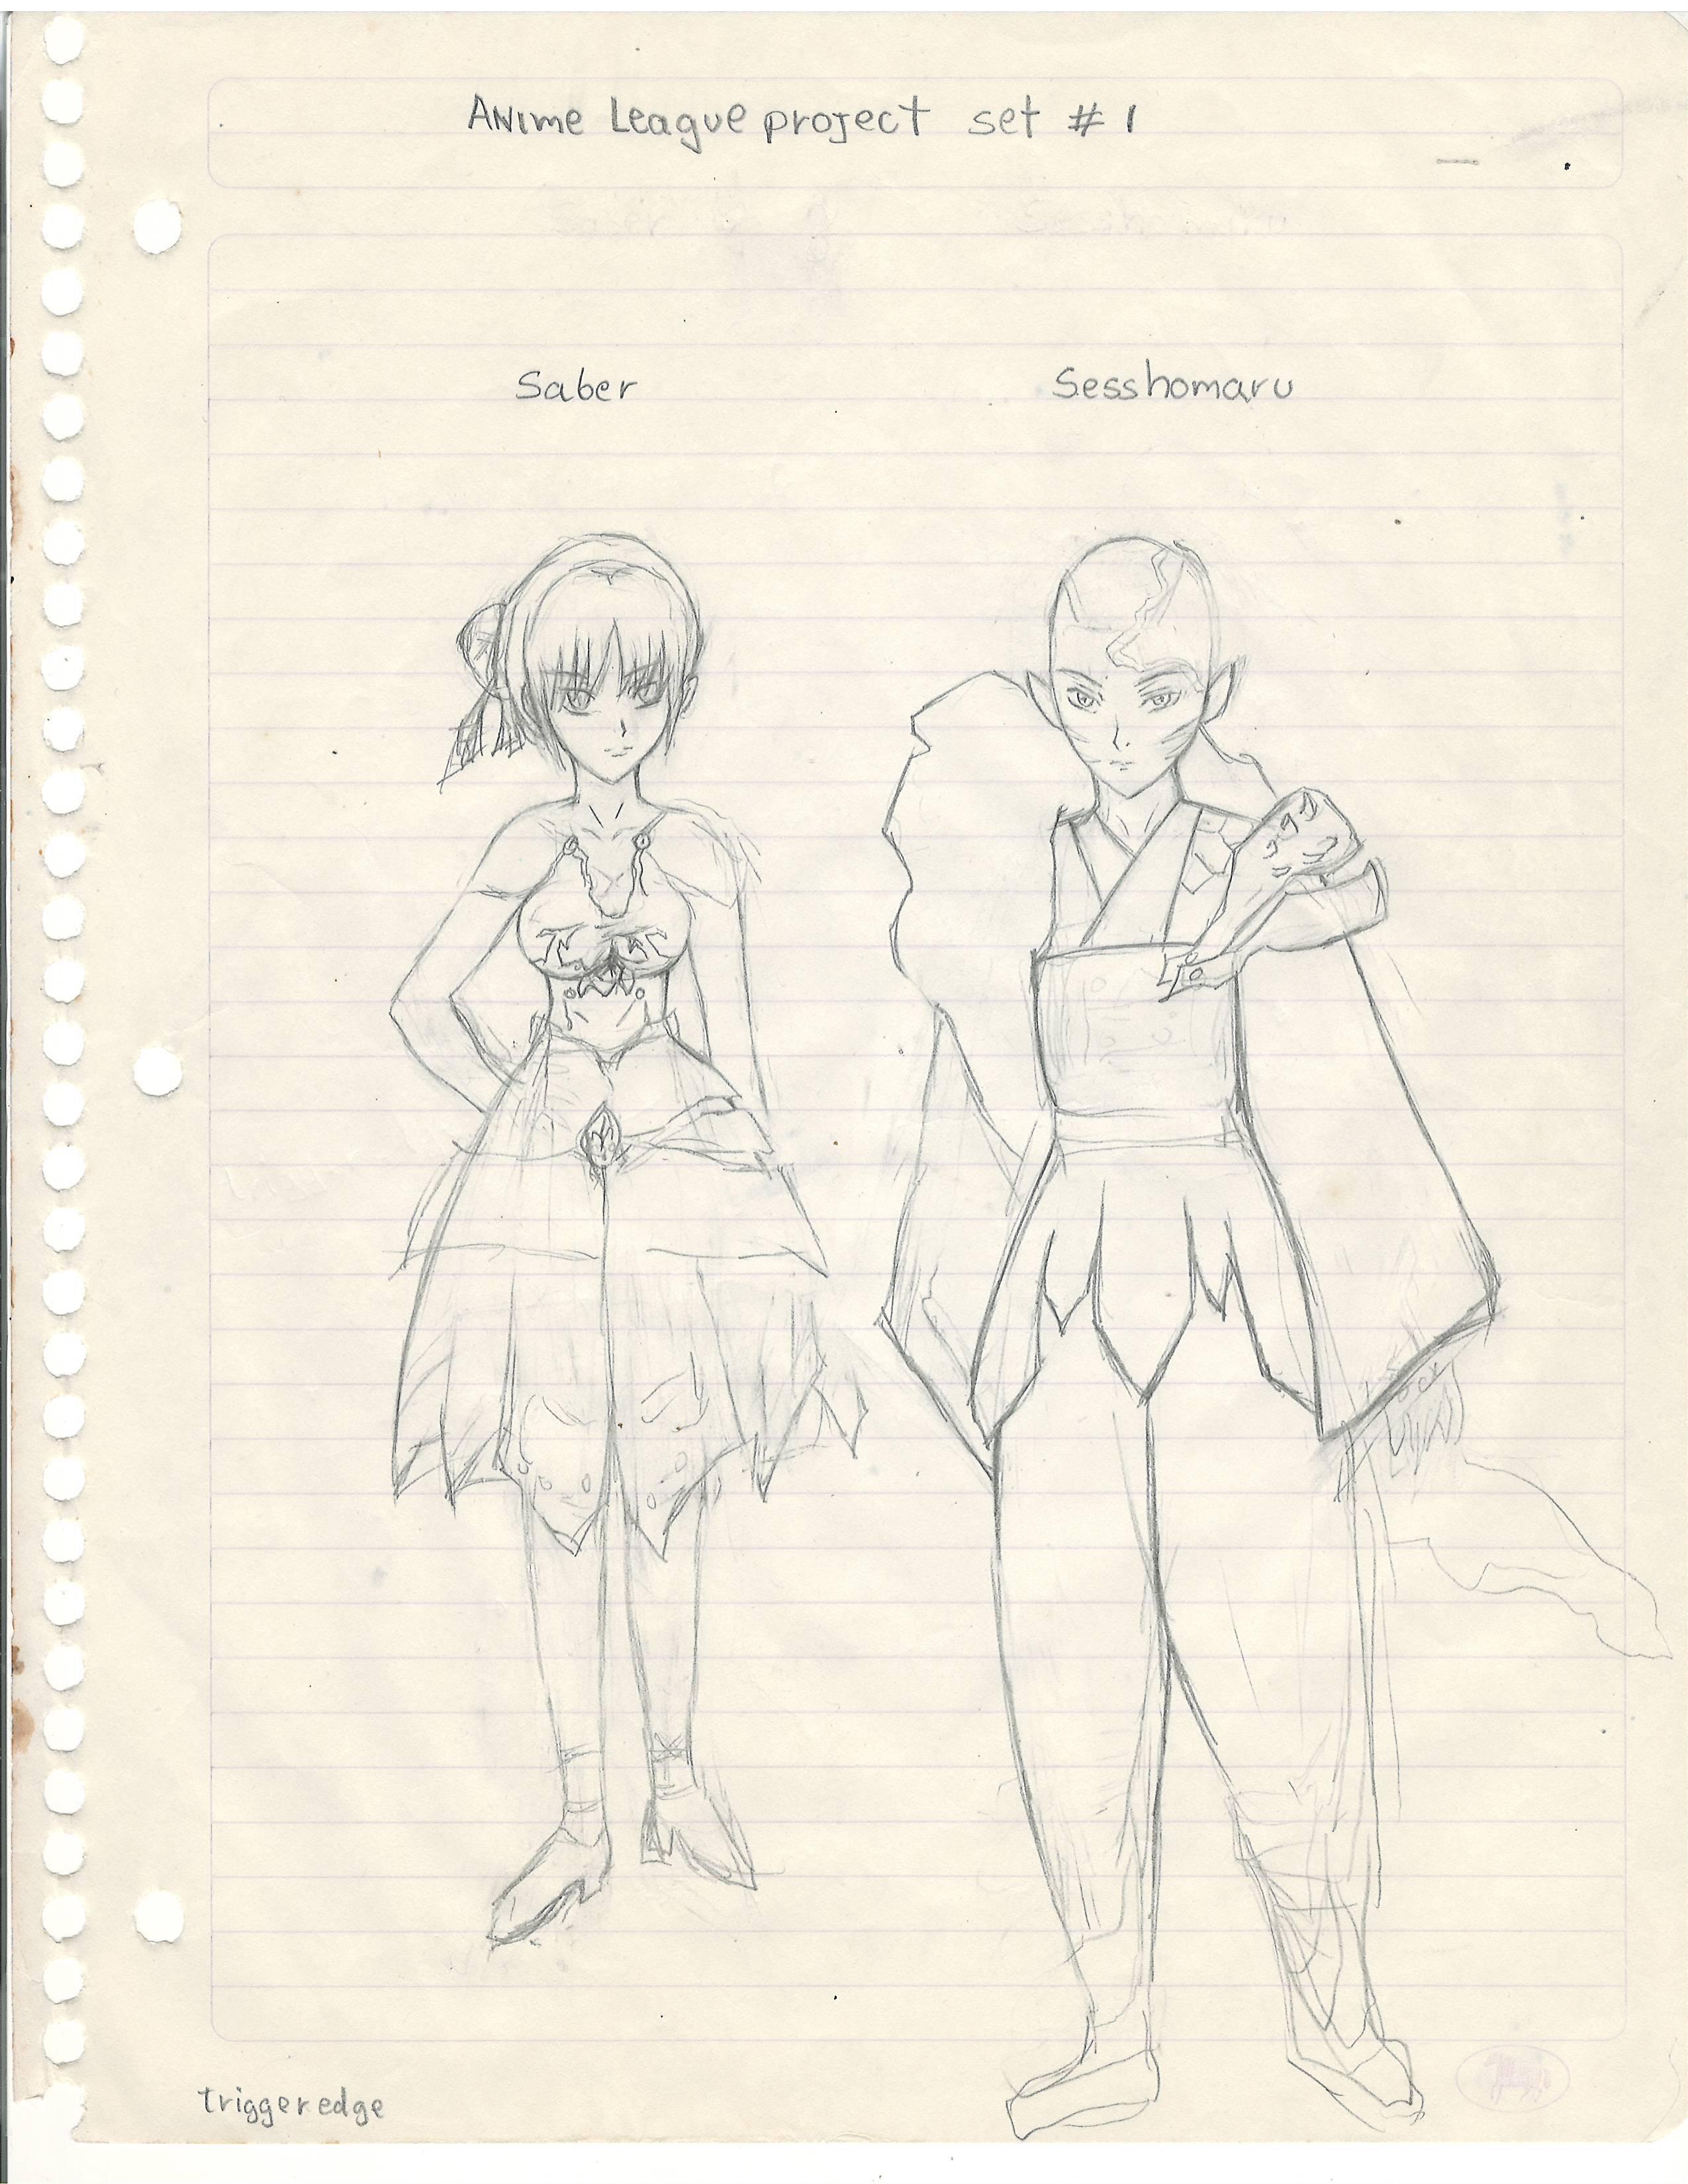 Arte conceptual - AnimeLeagueProject 5pk3kbjb8b3ozgczg